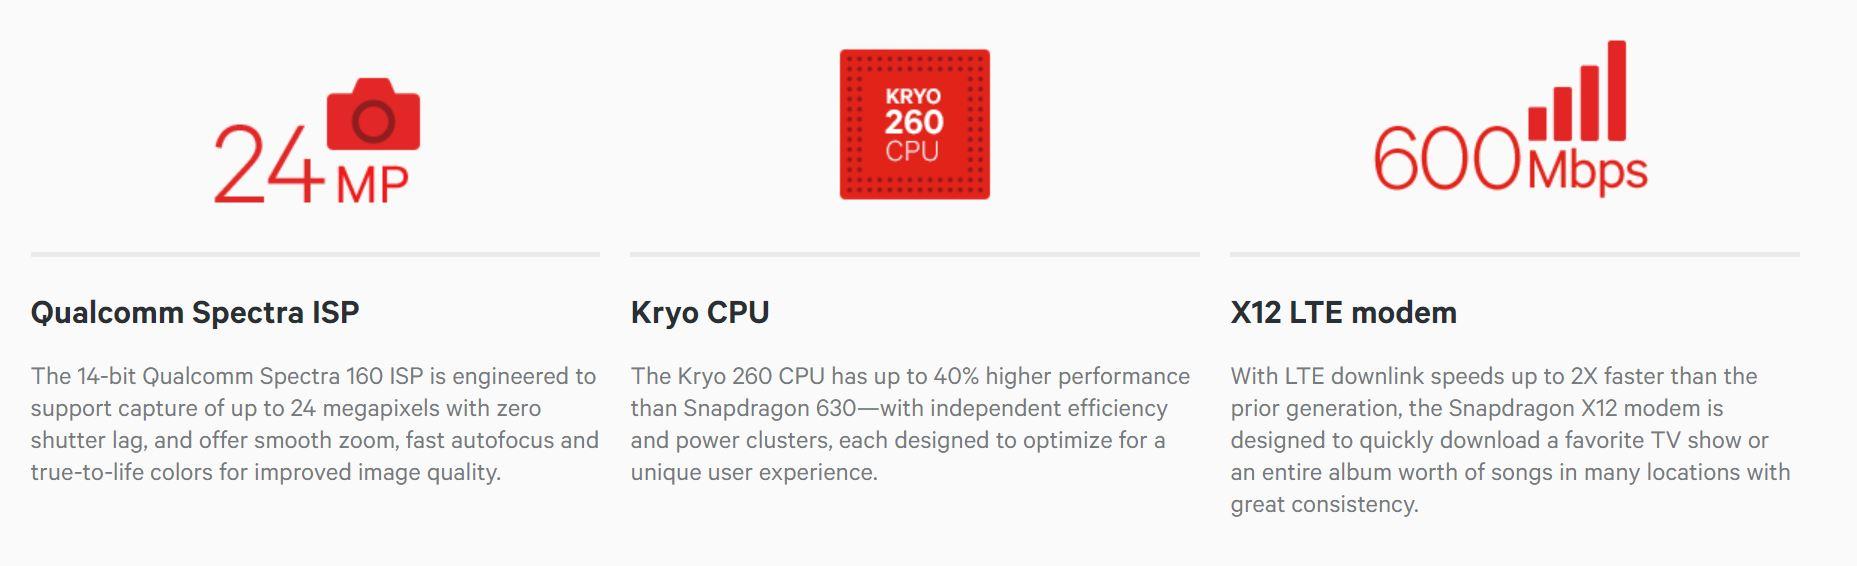 Snapdragon 636 CPU